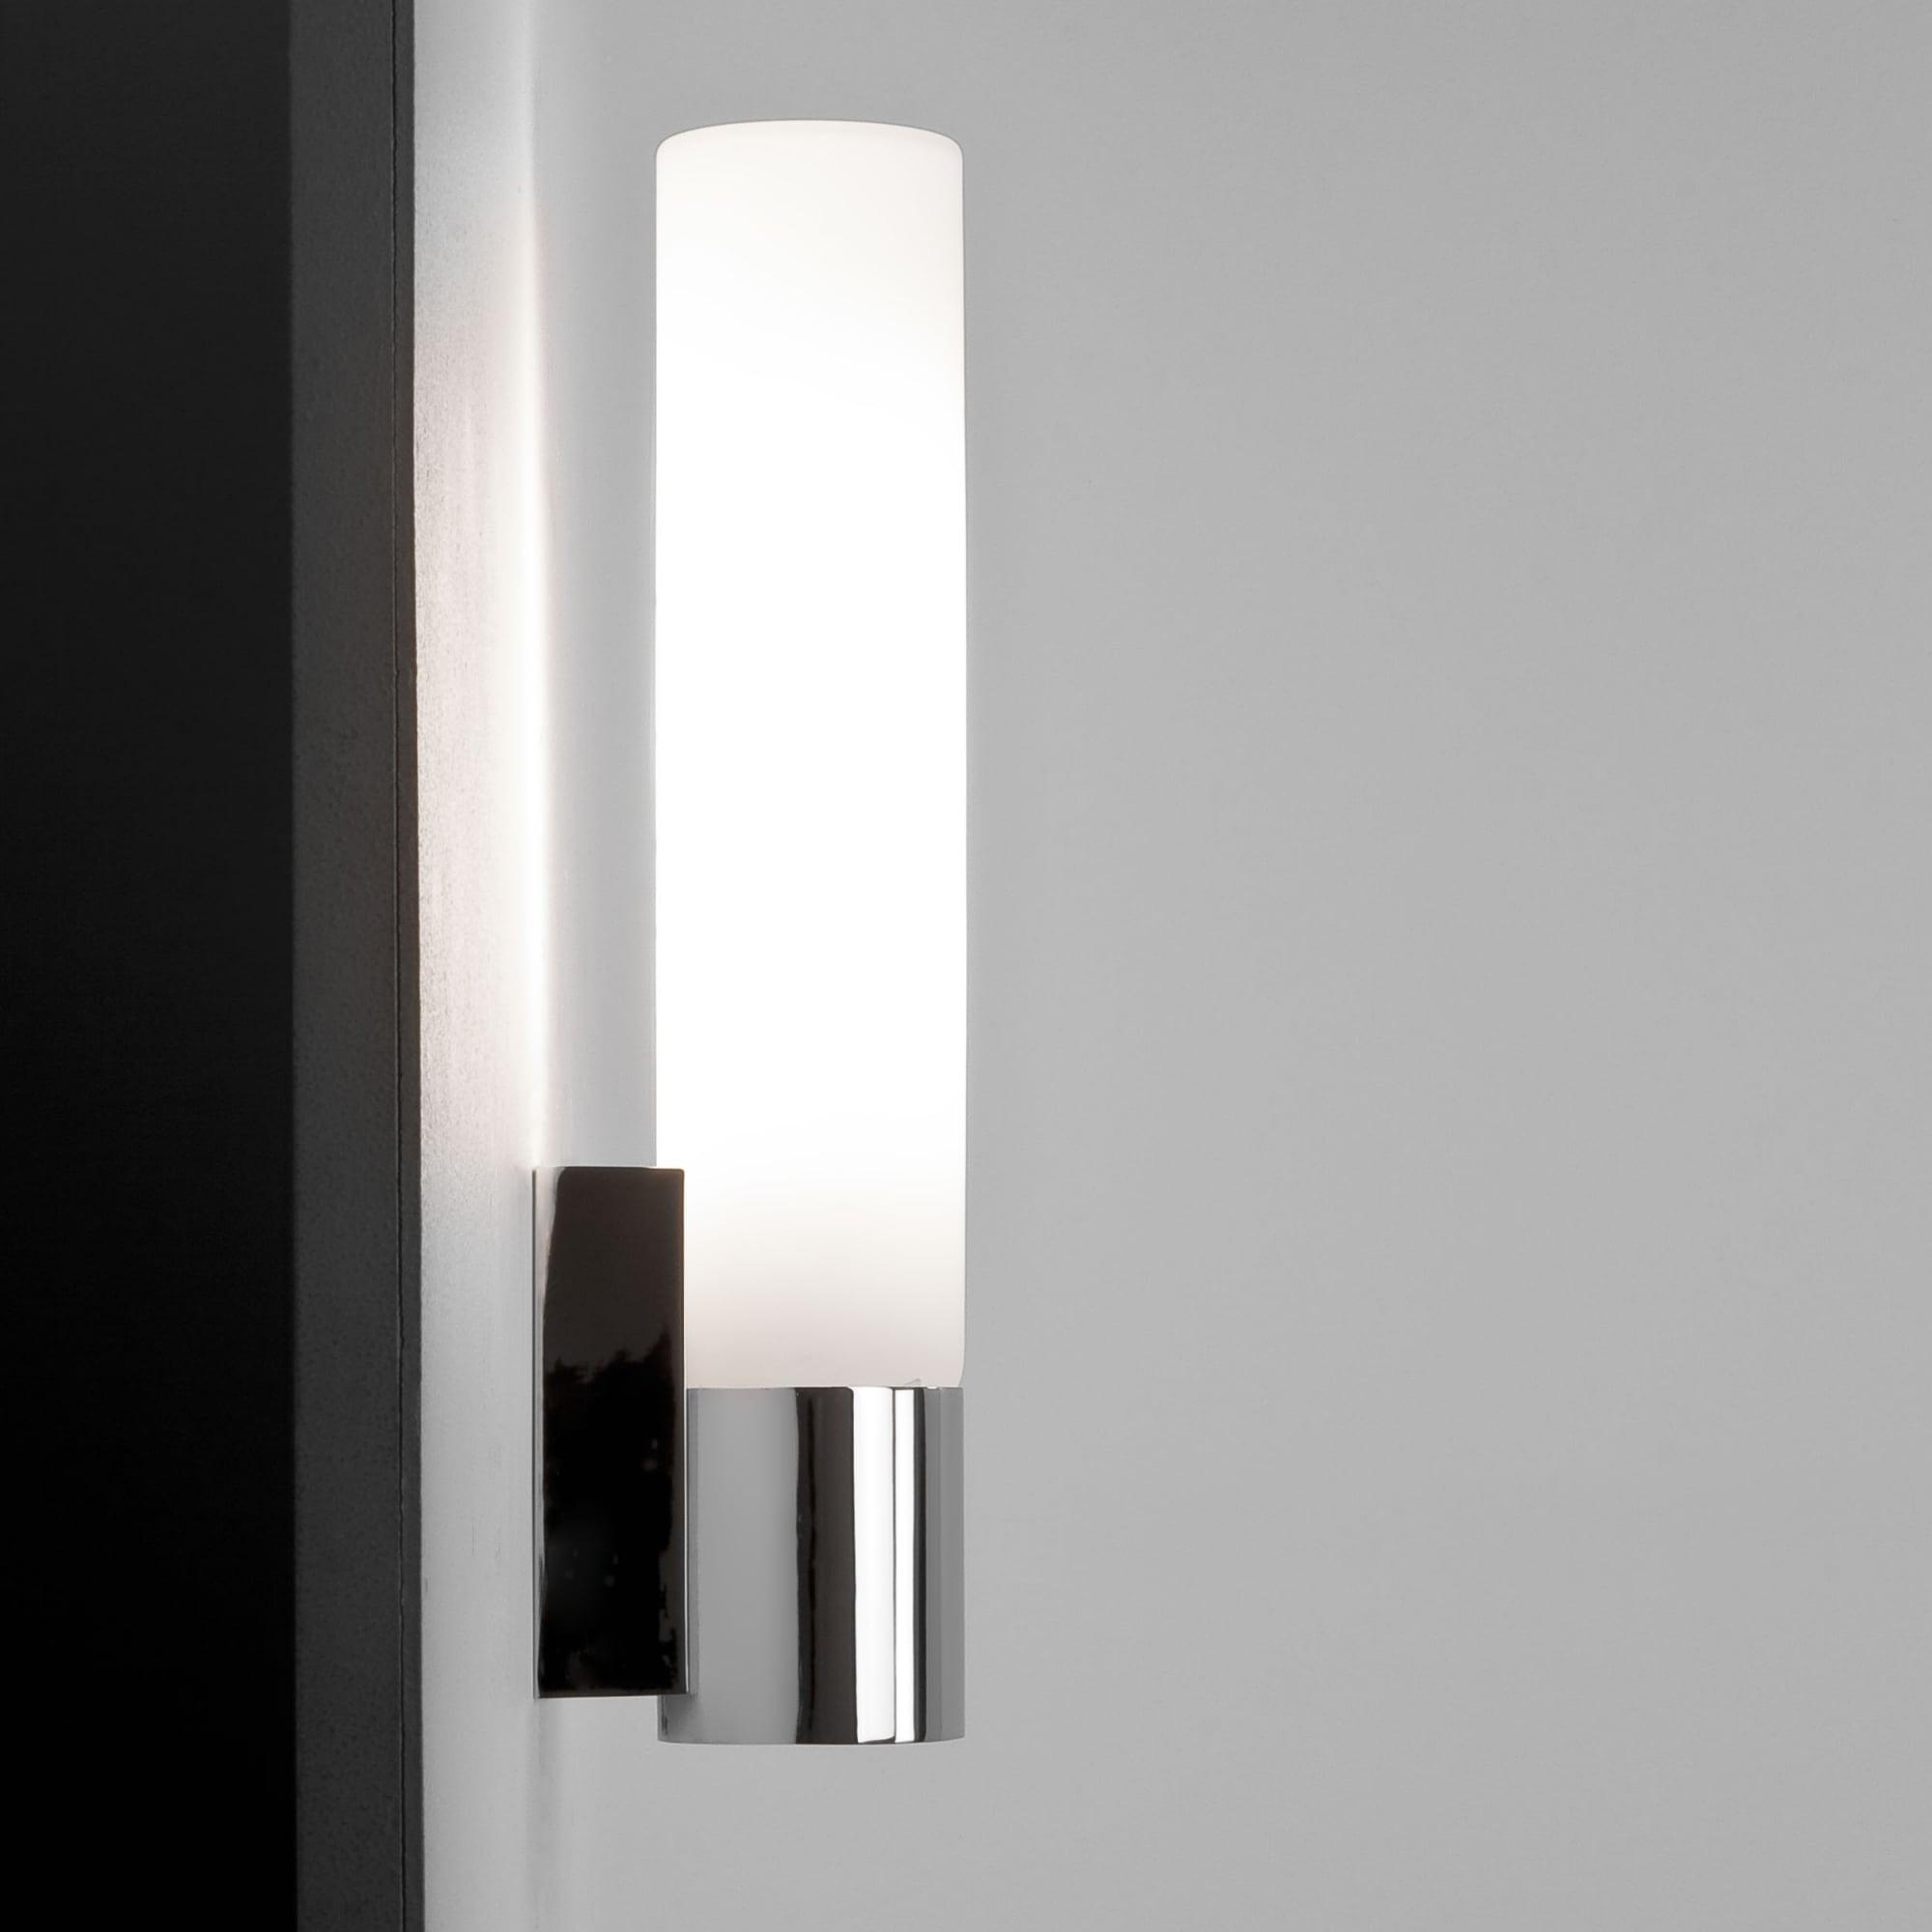 Astro 1060003 Kyoto 365mm Chrome Bathroom Wall Light Tube Ideas4lighting Sku34489i4l